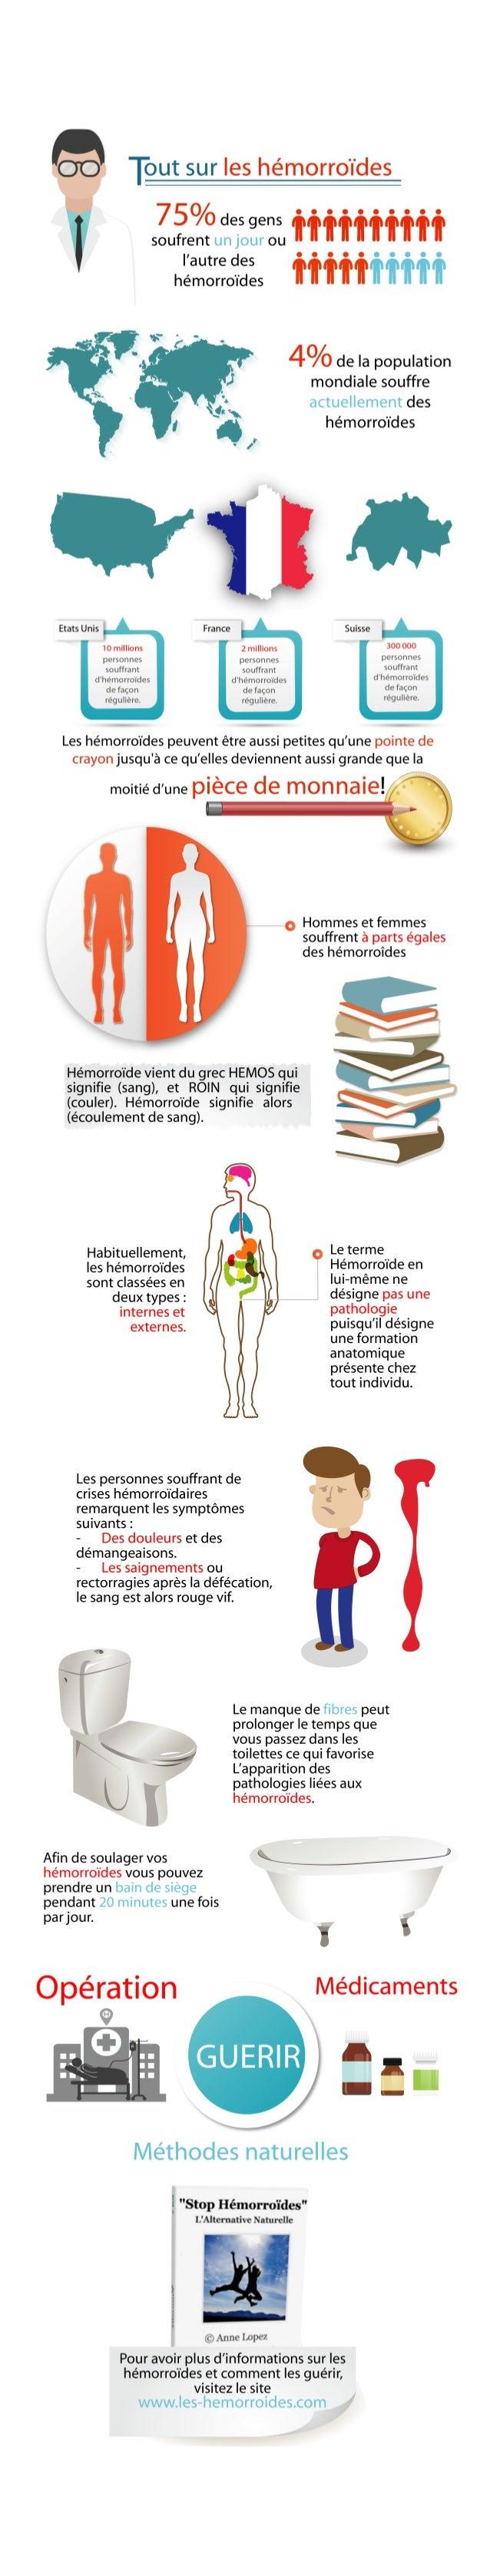 Soigner les hémorroïdes externes